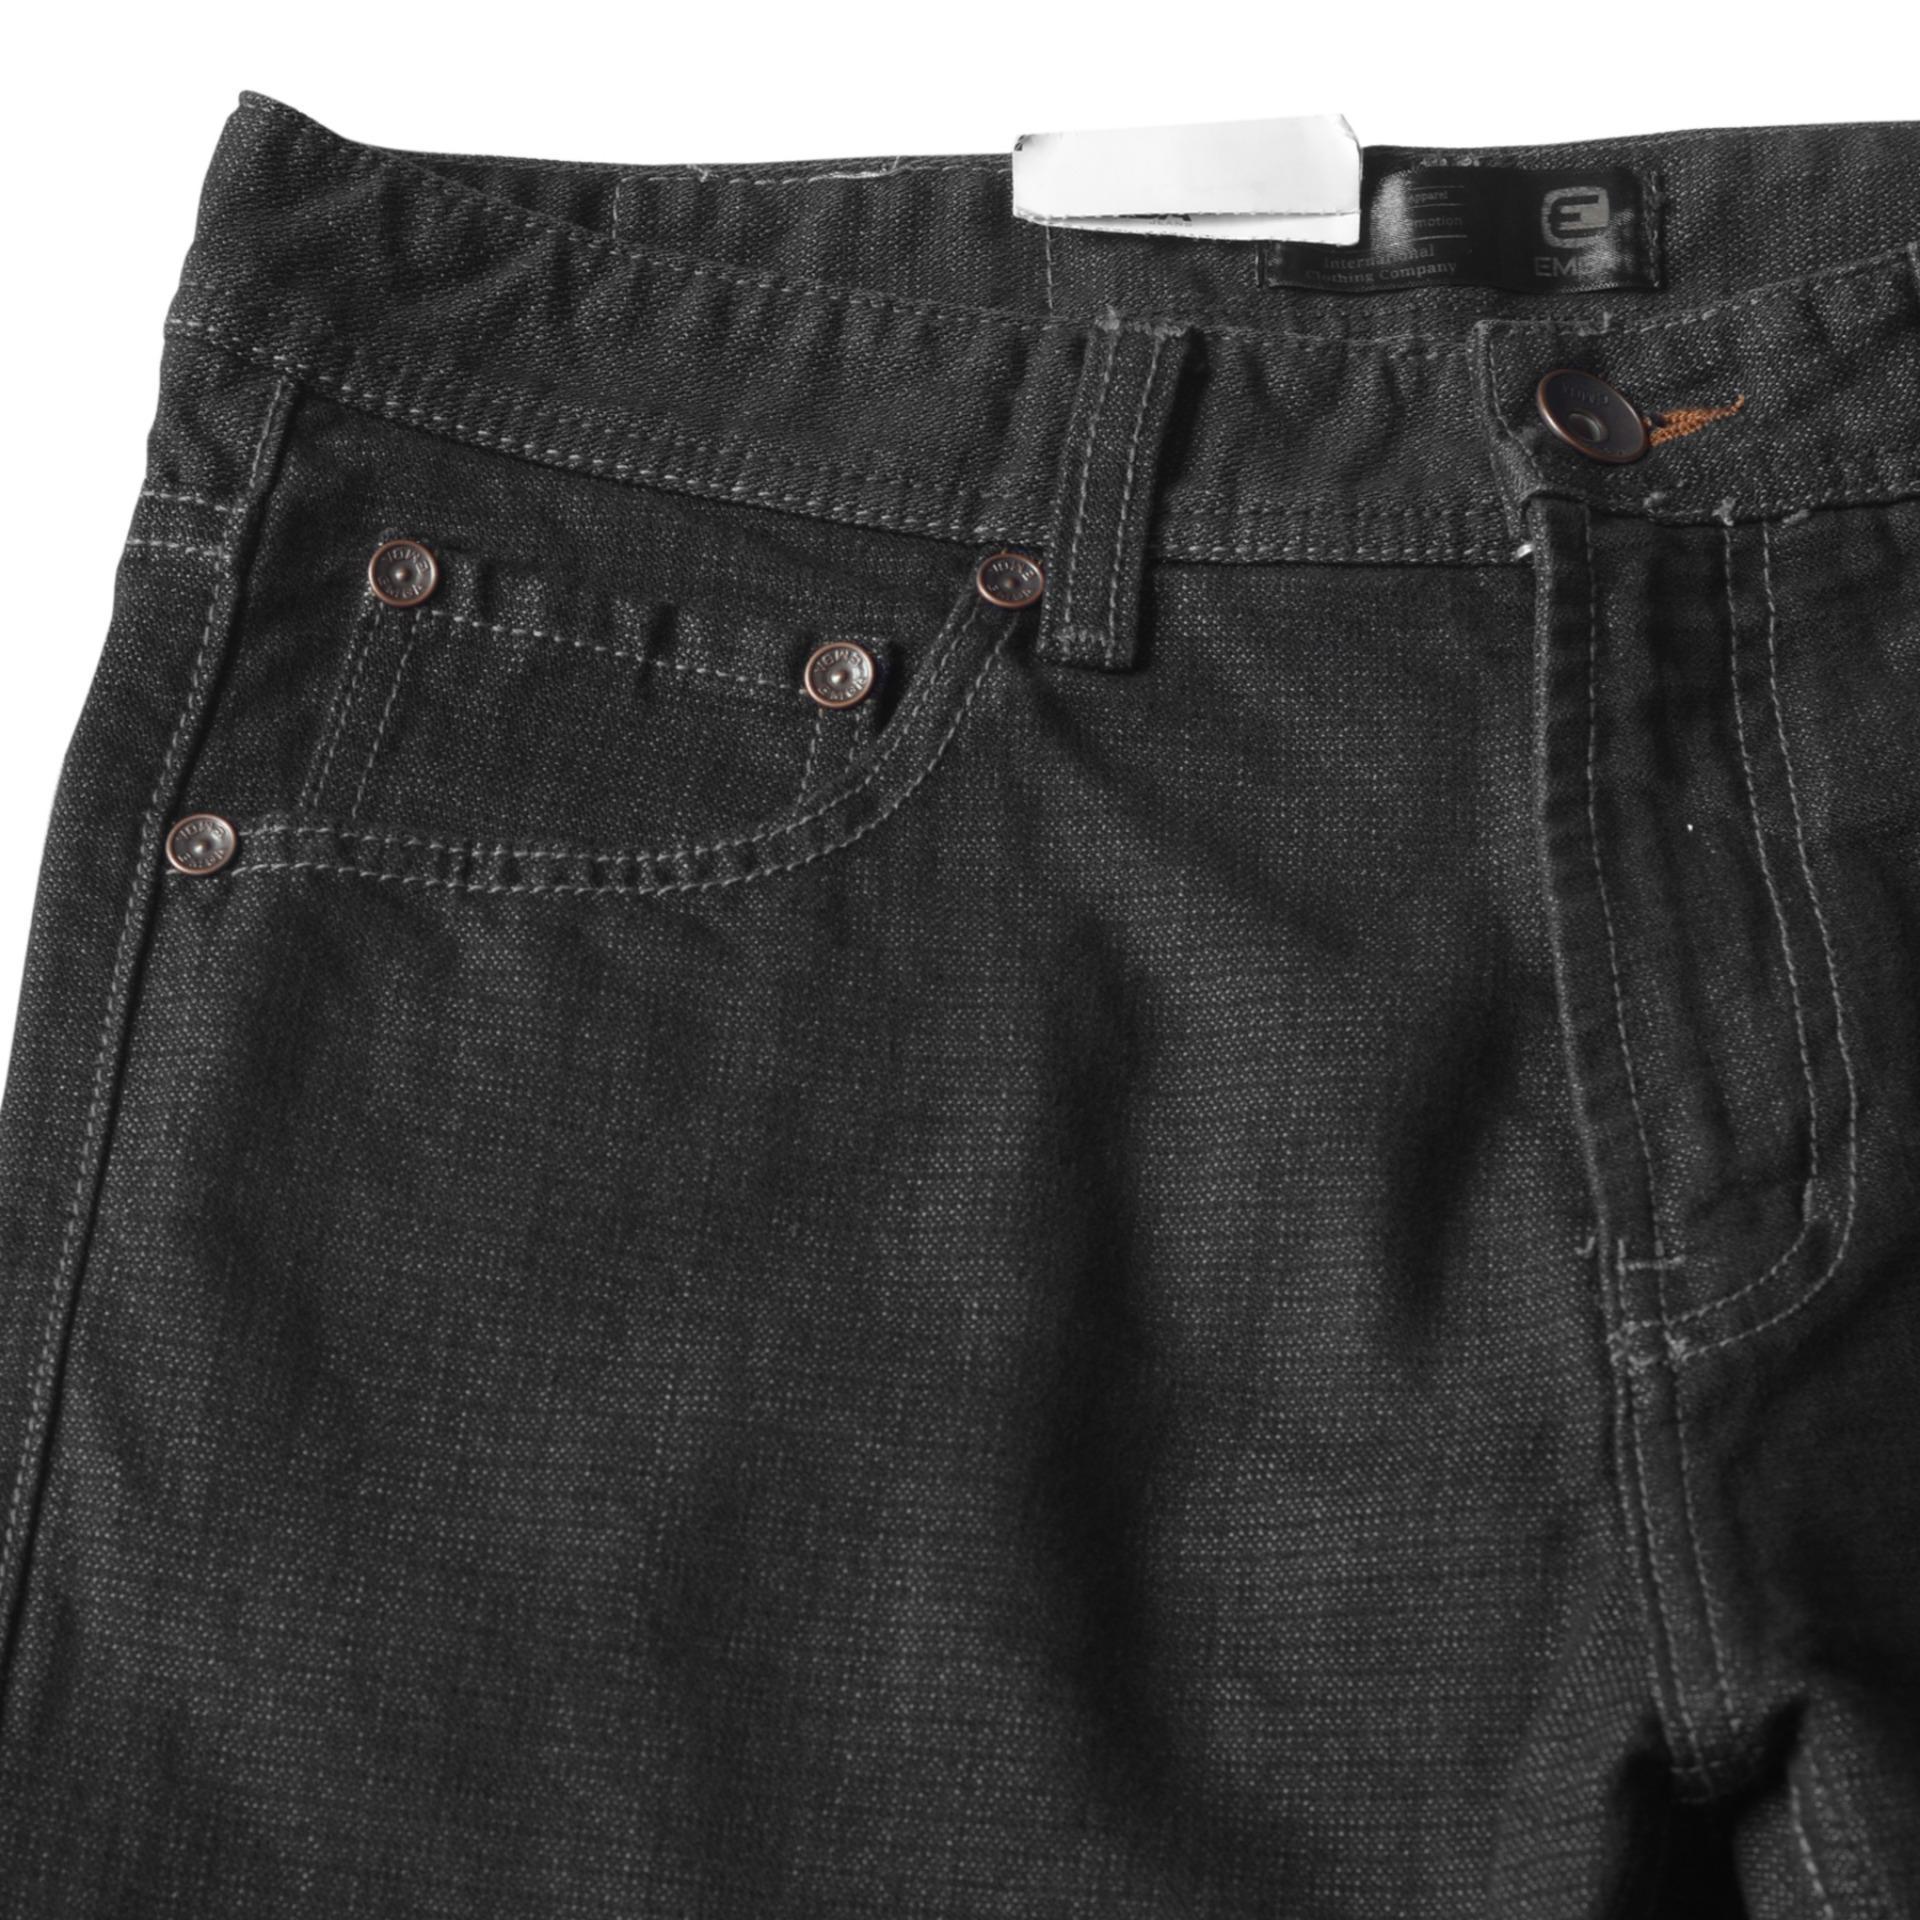 Emba Jeans Celana Panjang Pria Rodensi One 613 10138 20 Heavy Stone Fm316 Warna Hs Medium Biru 30 Bs 081 Jordan Regular Jet Black